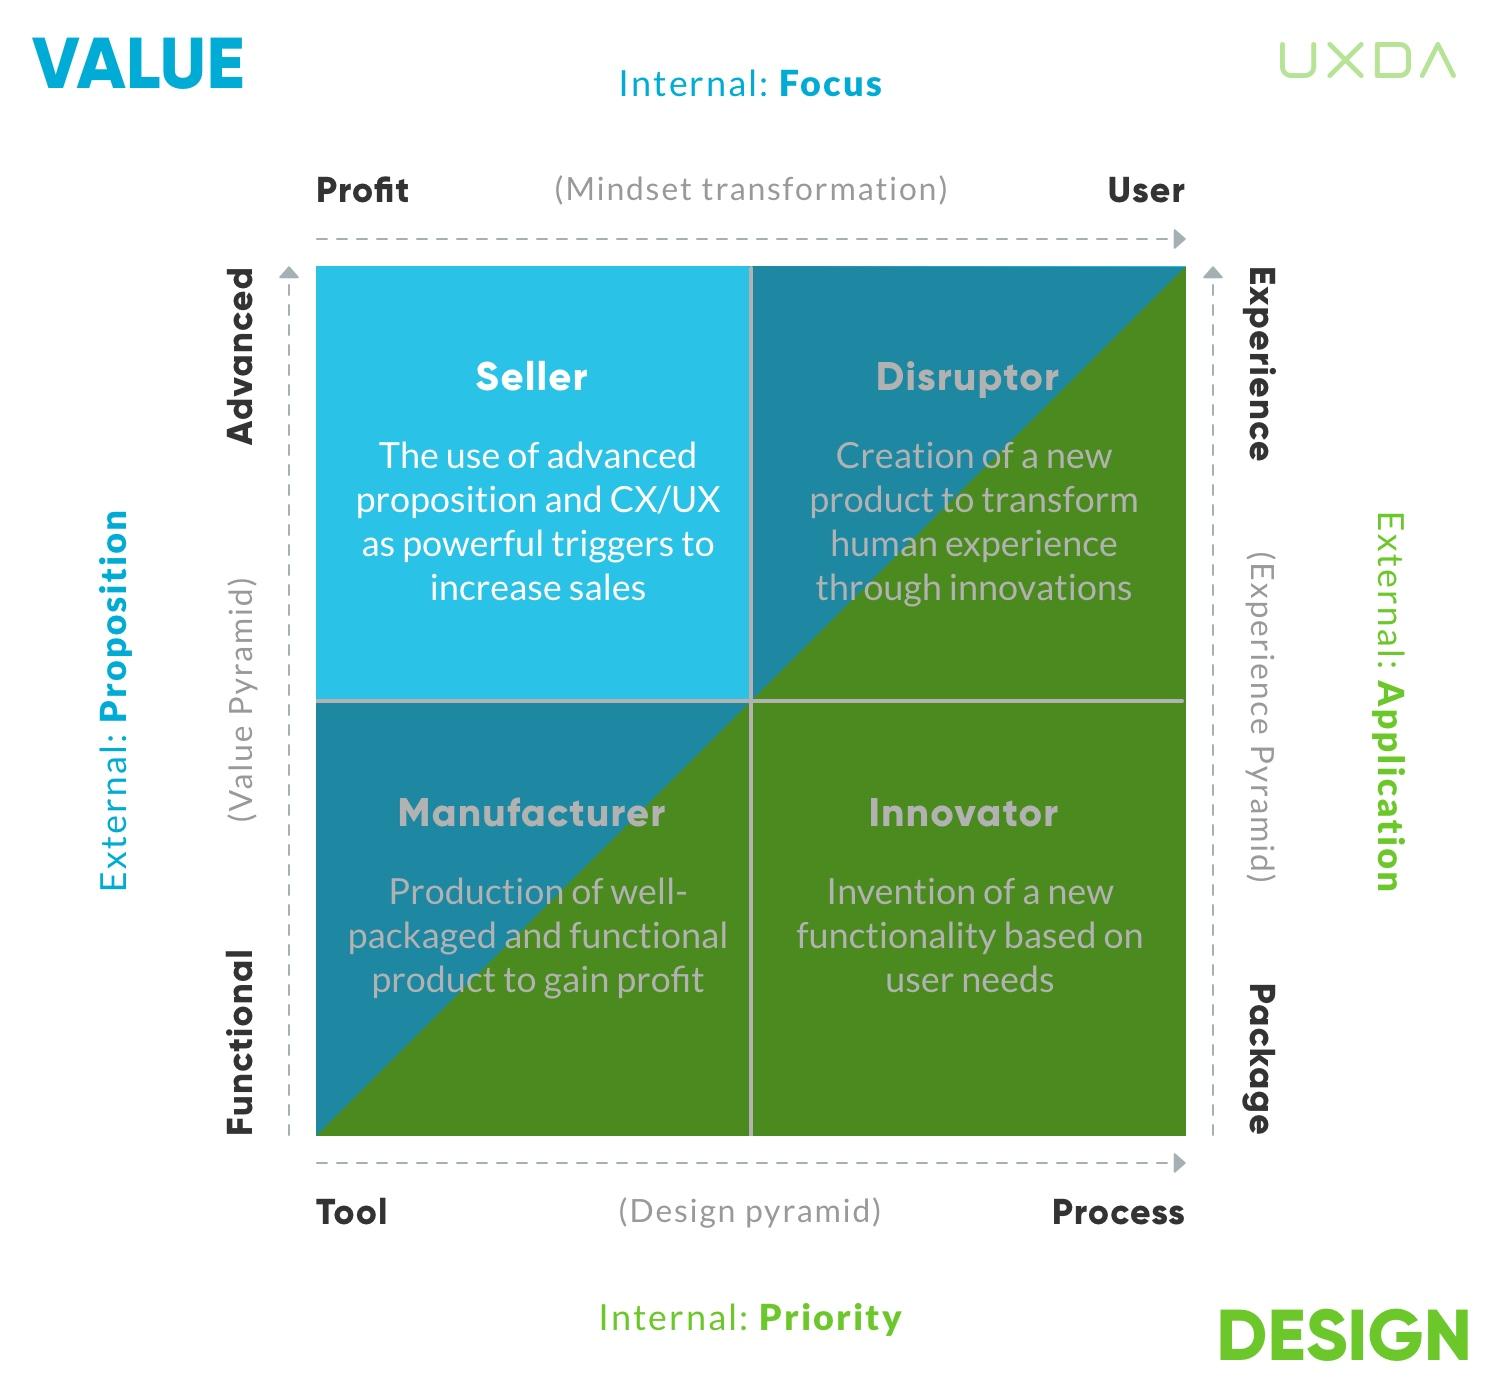 financial-design-matrix-for-banking-disruption-14.jpg